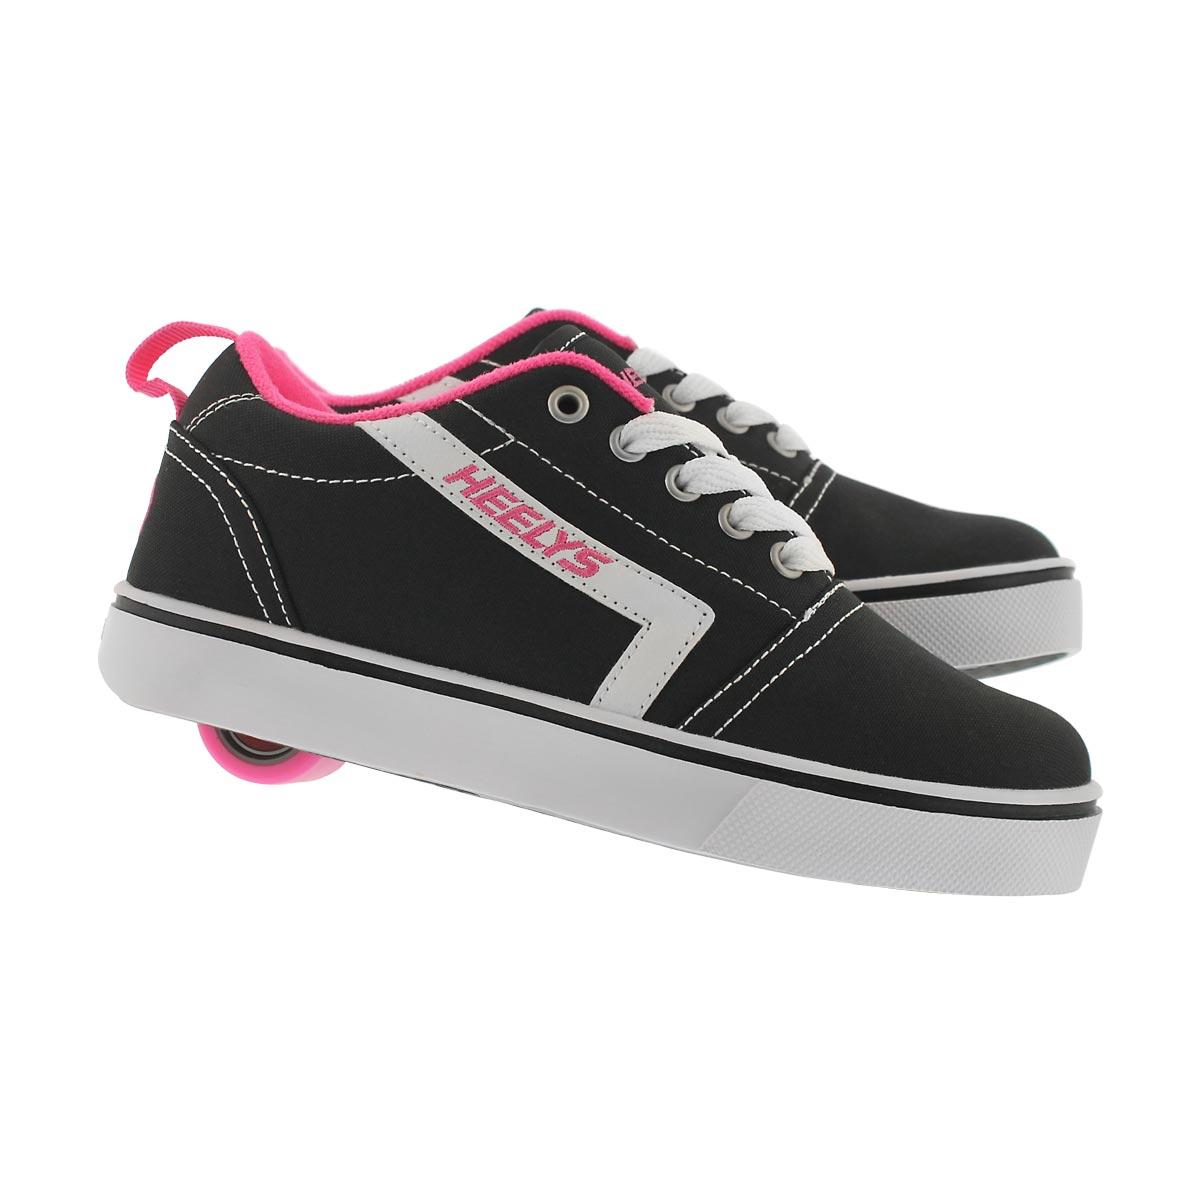 Grls Gr8 Pro blk/wht/pnk skate sneaker